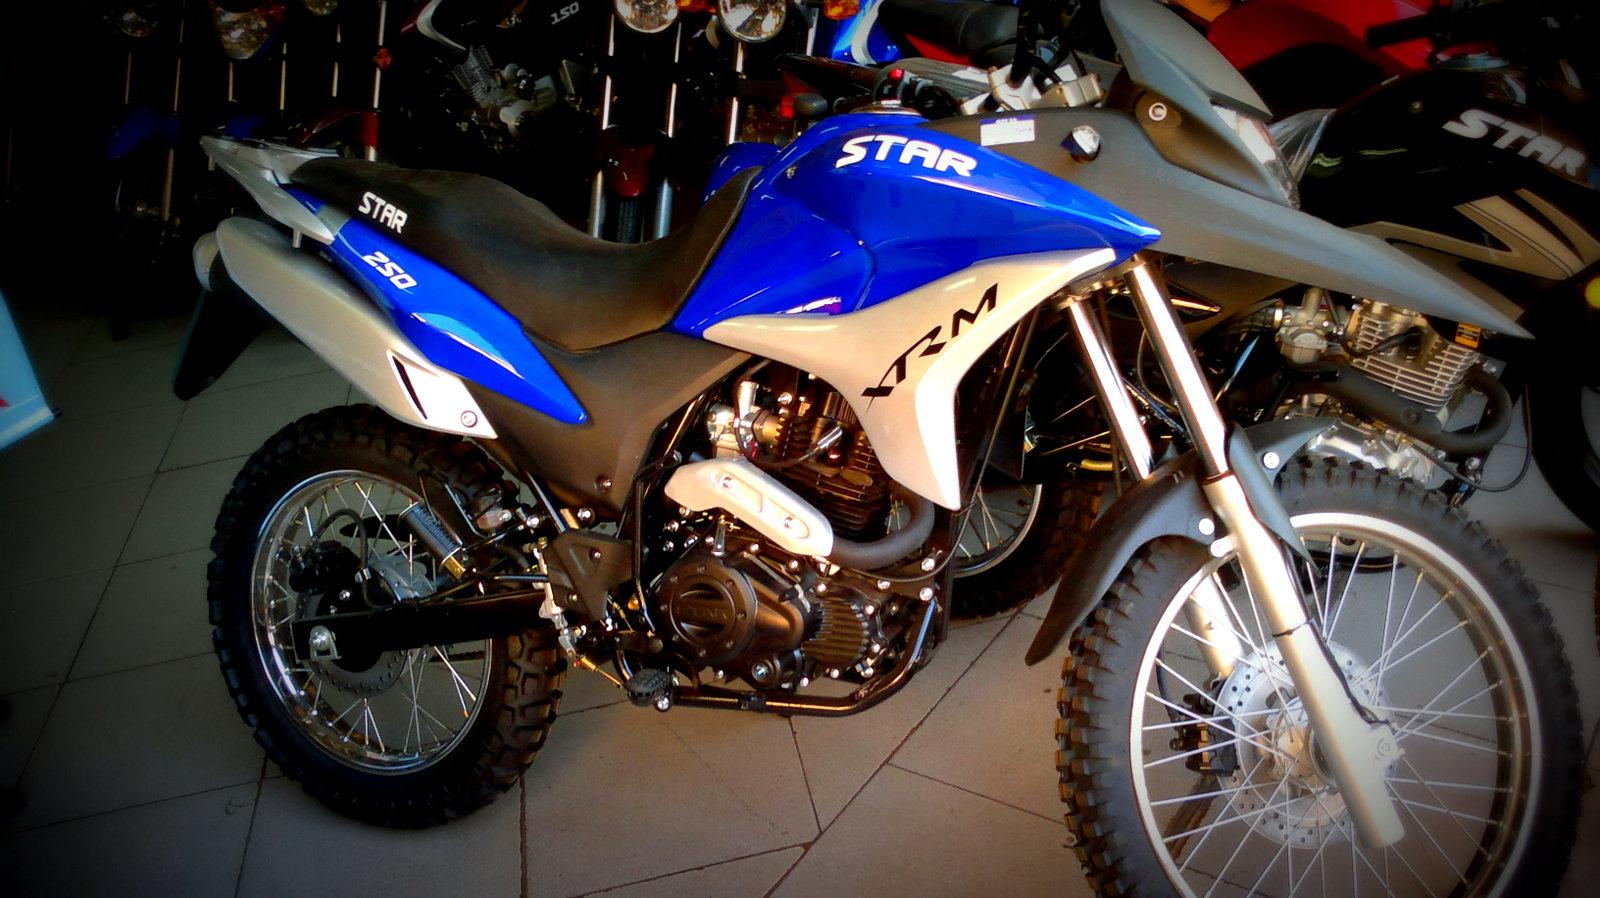 Nueva star xrm 250 vs kenton hunter 250 - Motores com py